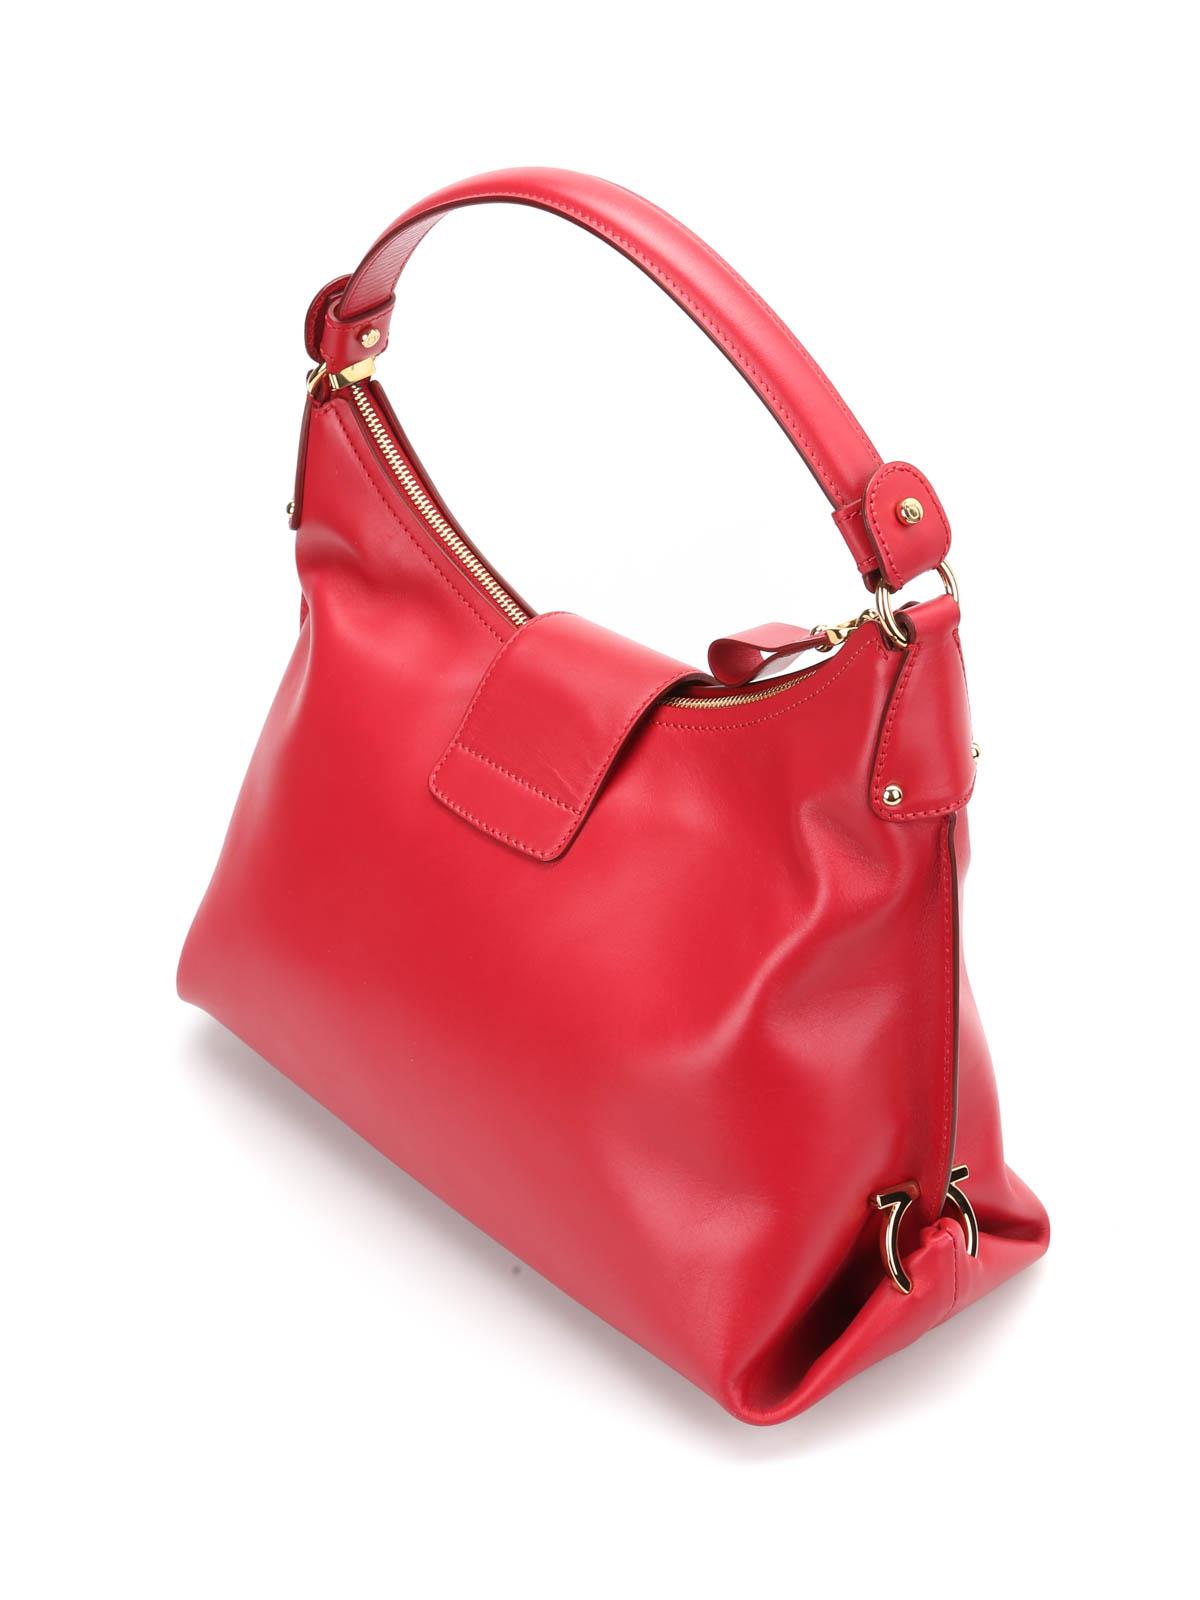 fe6df8f9b4 Salvatore Ferragamo - Fanisa hobo bag - totes bags - R 21E654 ...